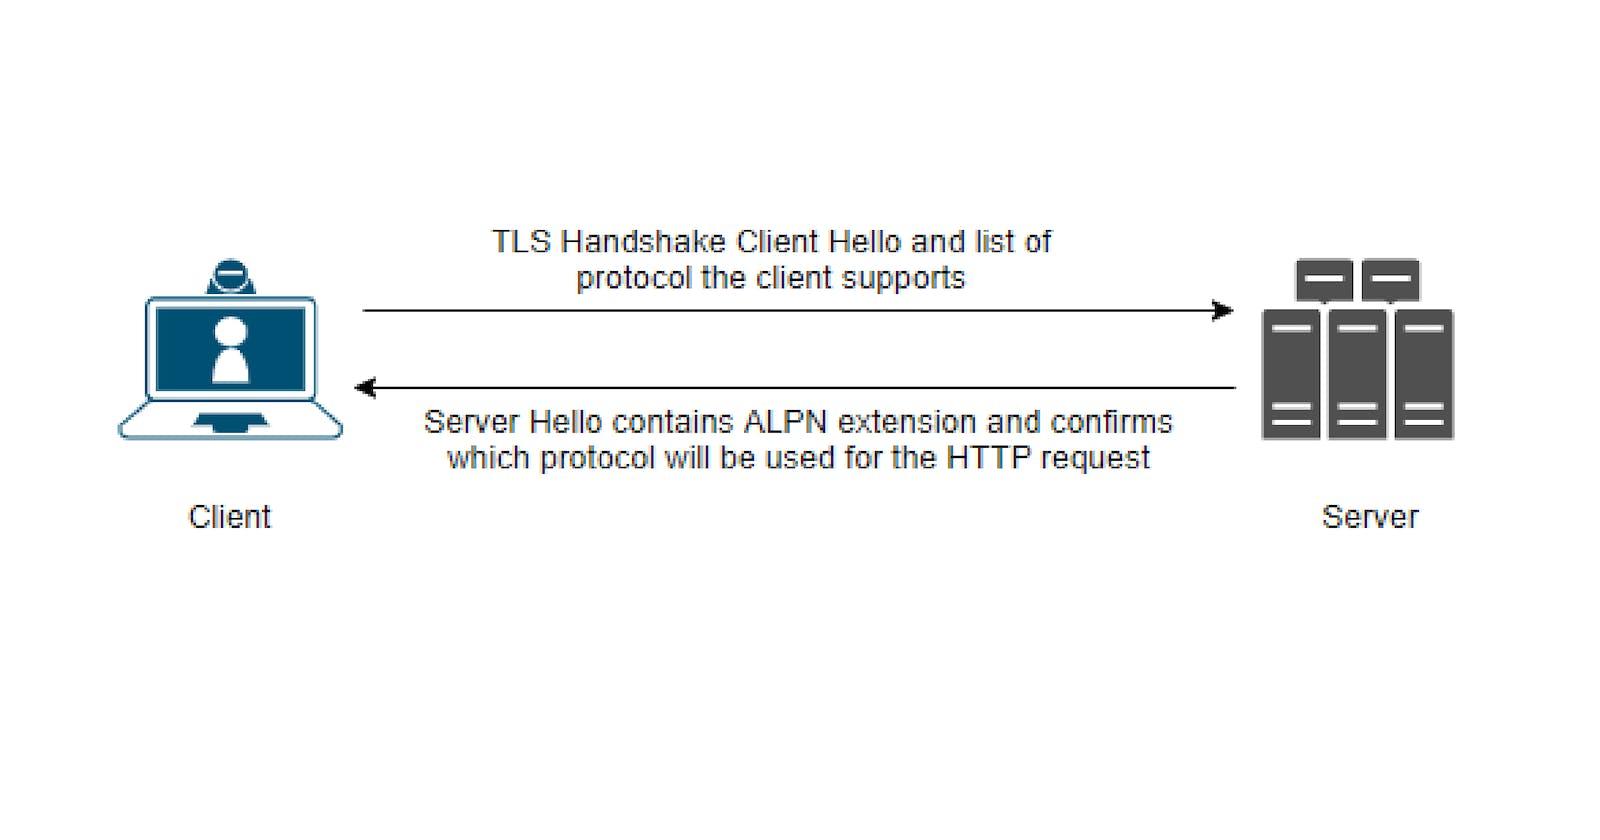 Application Layer Protocol Negotiation